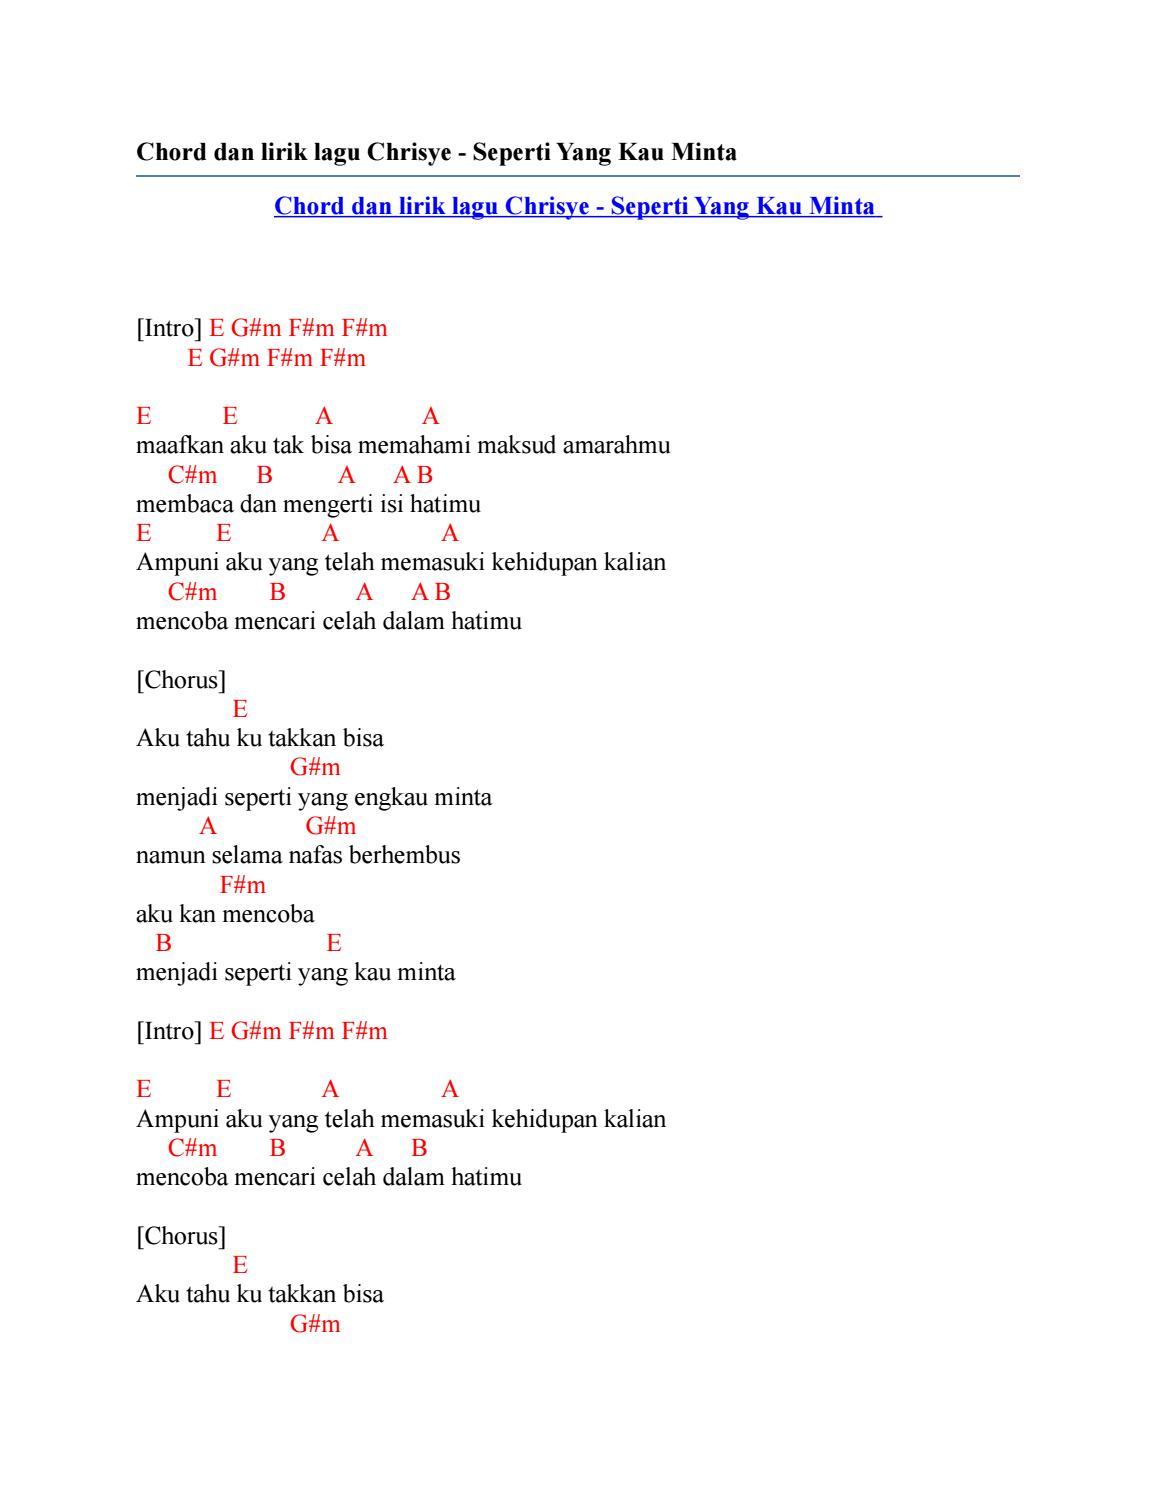 Chrisye - Seperti Yang Kau Minta Lyrics | Genius Lyrics